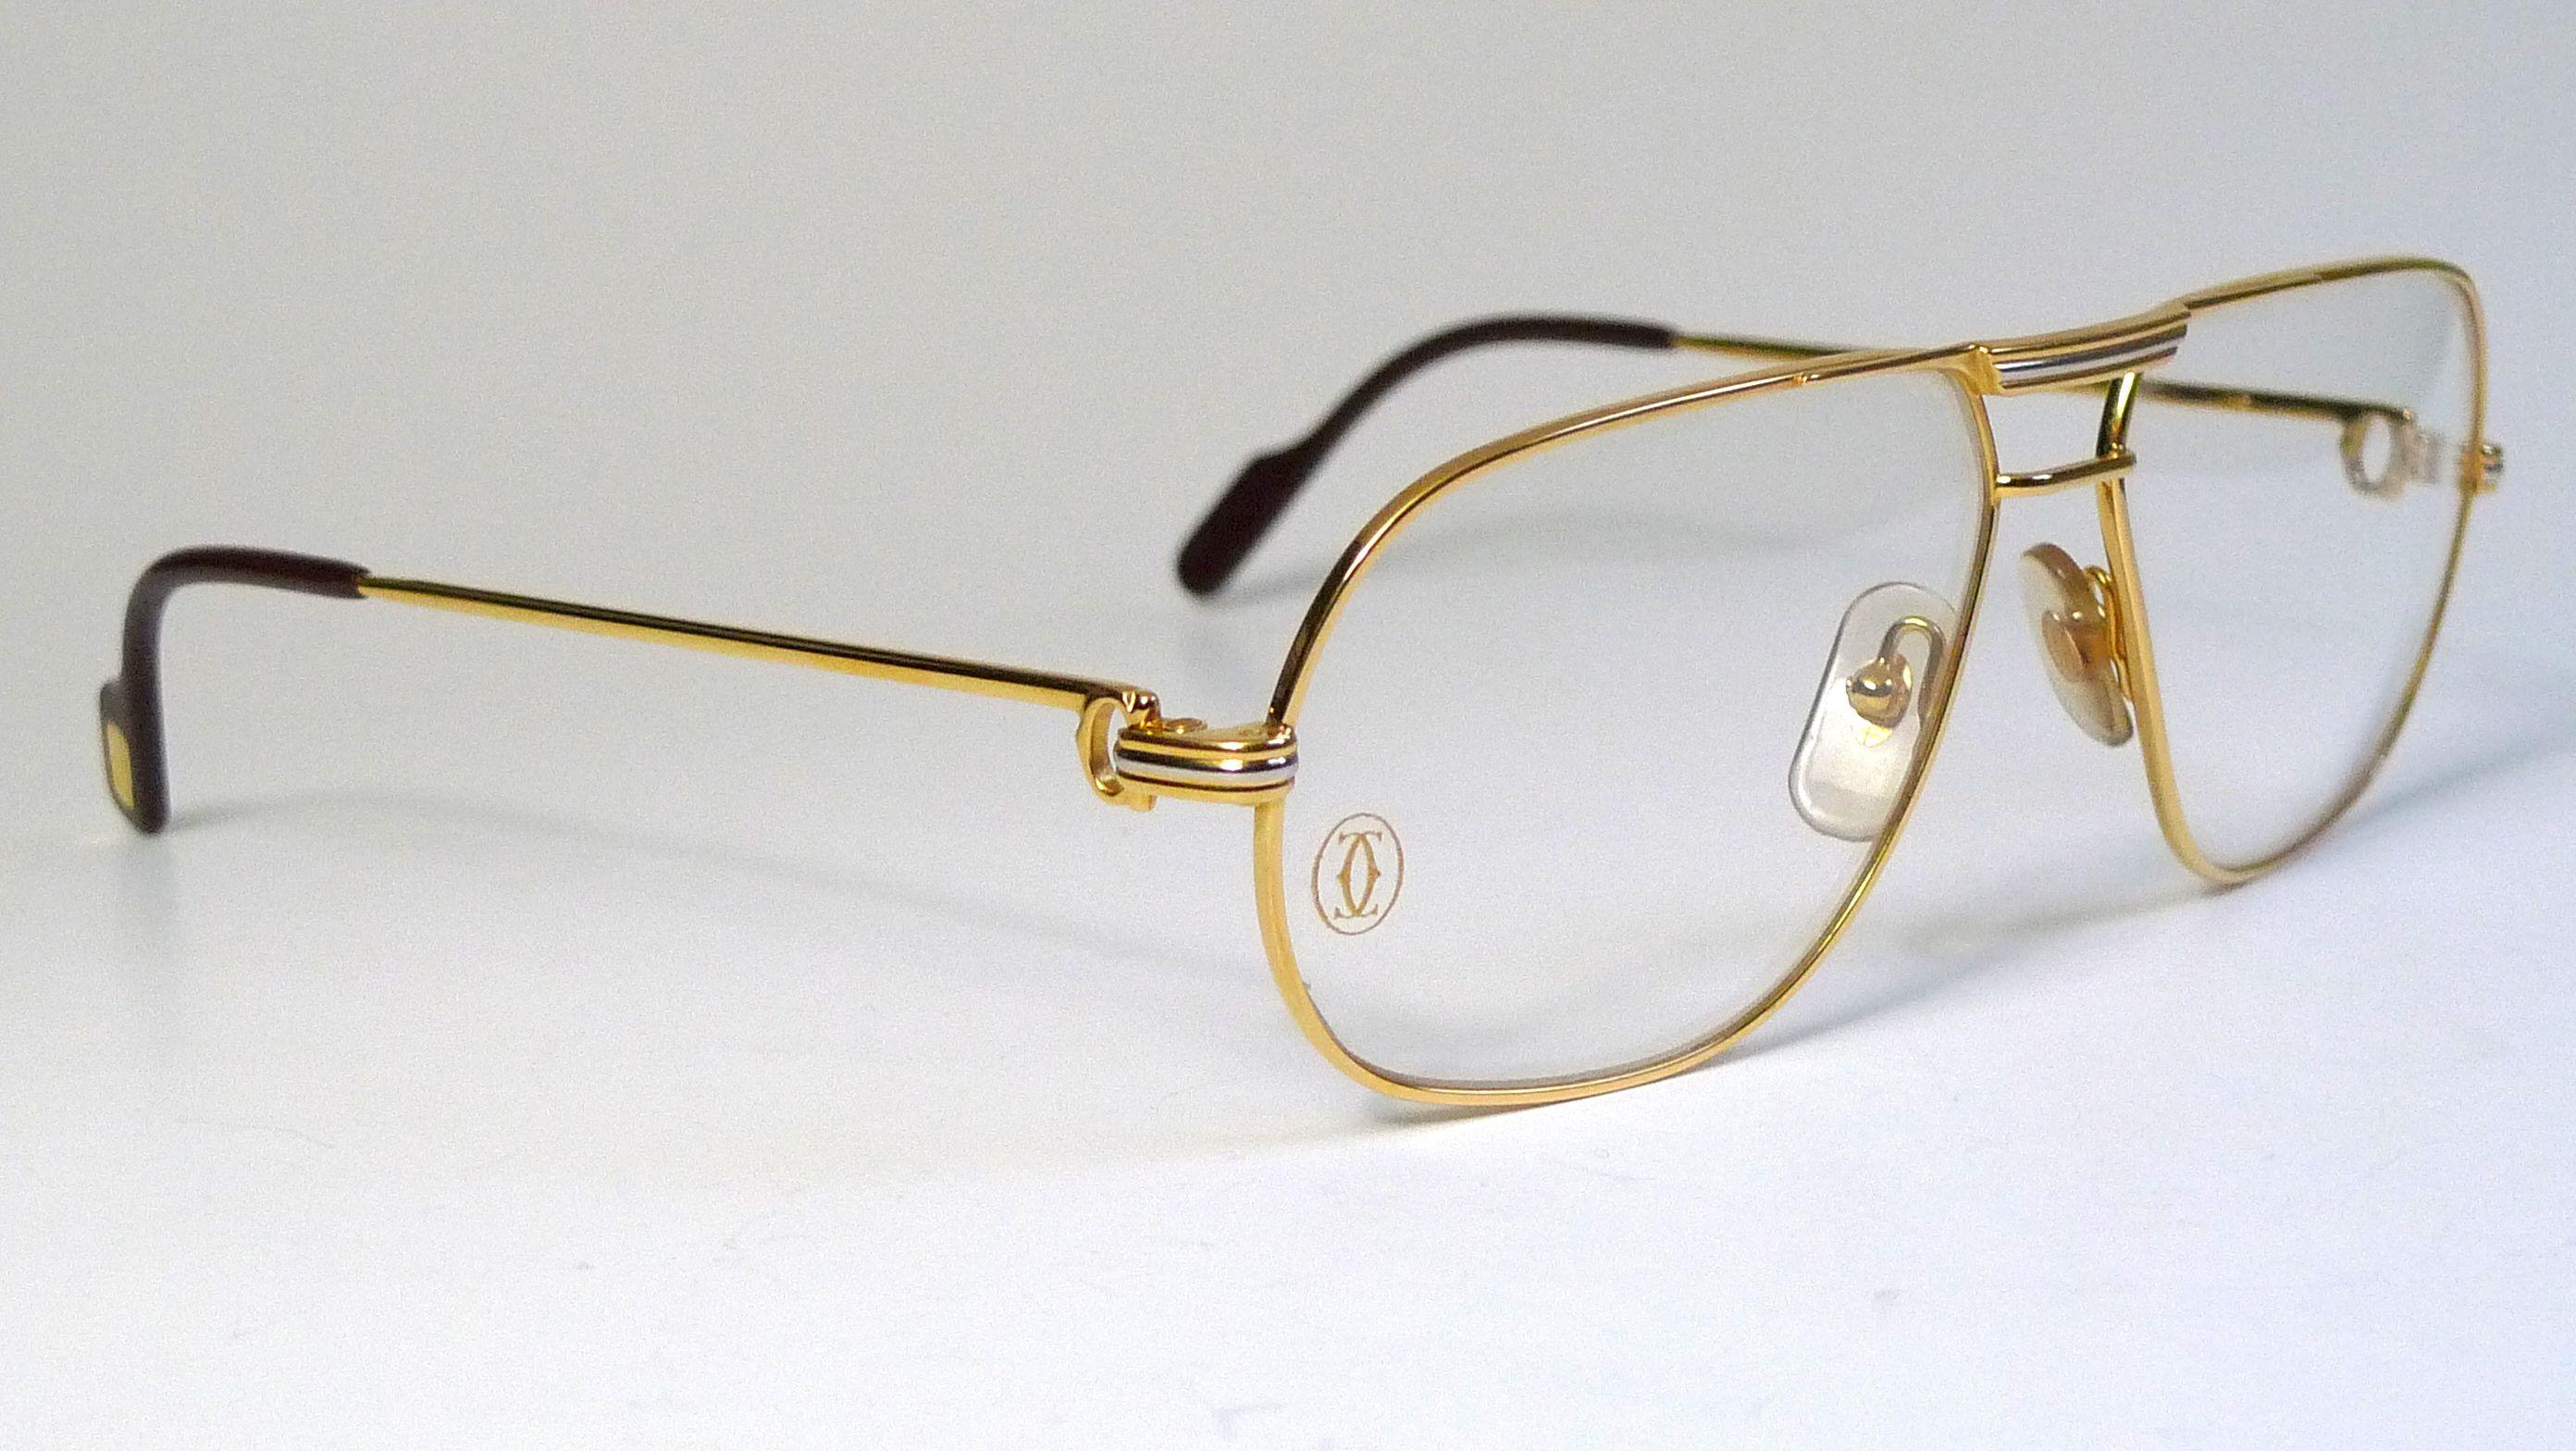 Cartier Tank Louis Cartier Vintage For Me Lunettes Okulary Sonnenbrille 眼镜 Sunglasses Frame